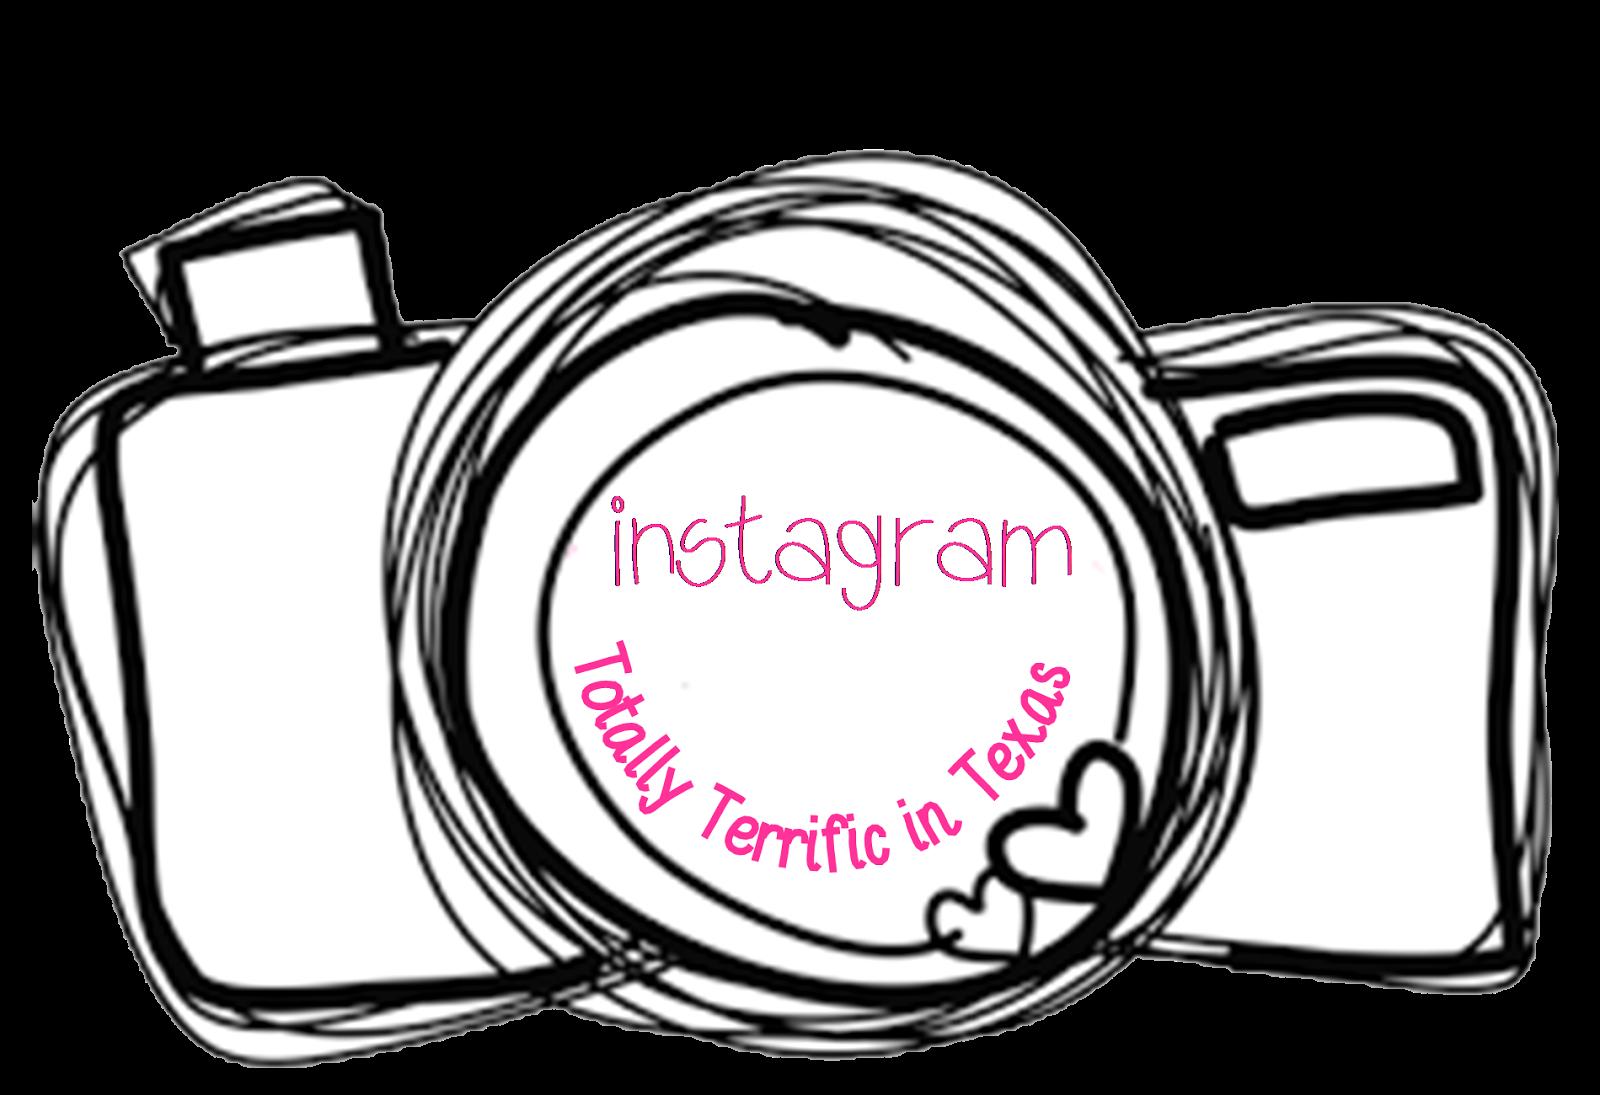 http://instagram.com/totallyterrificintexas#